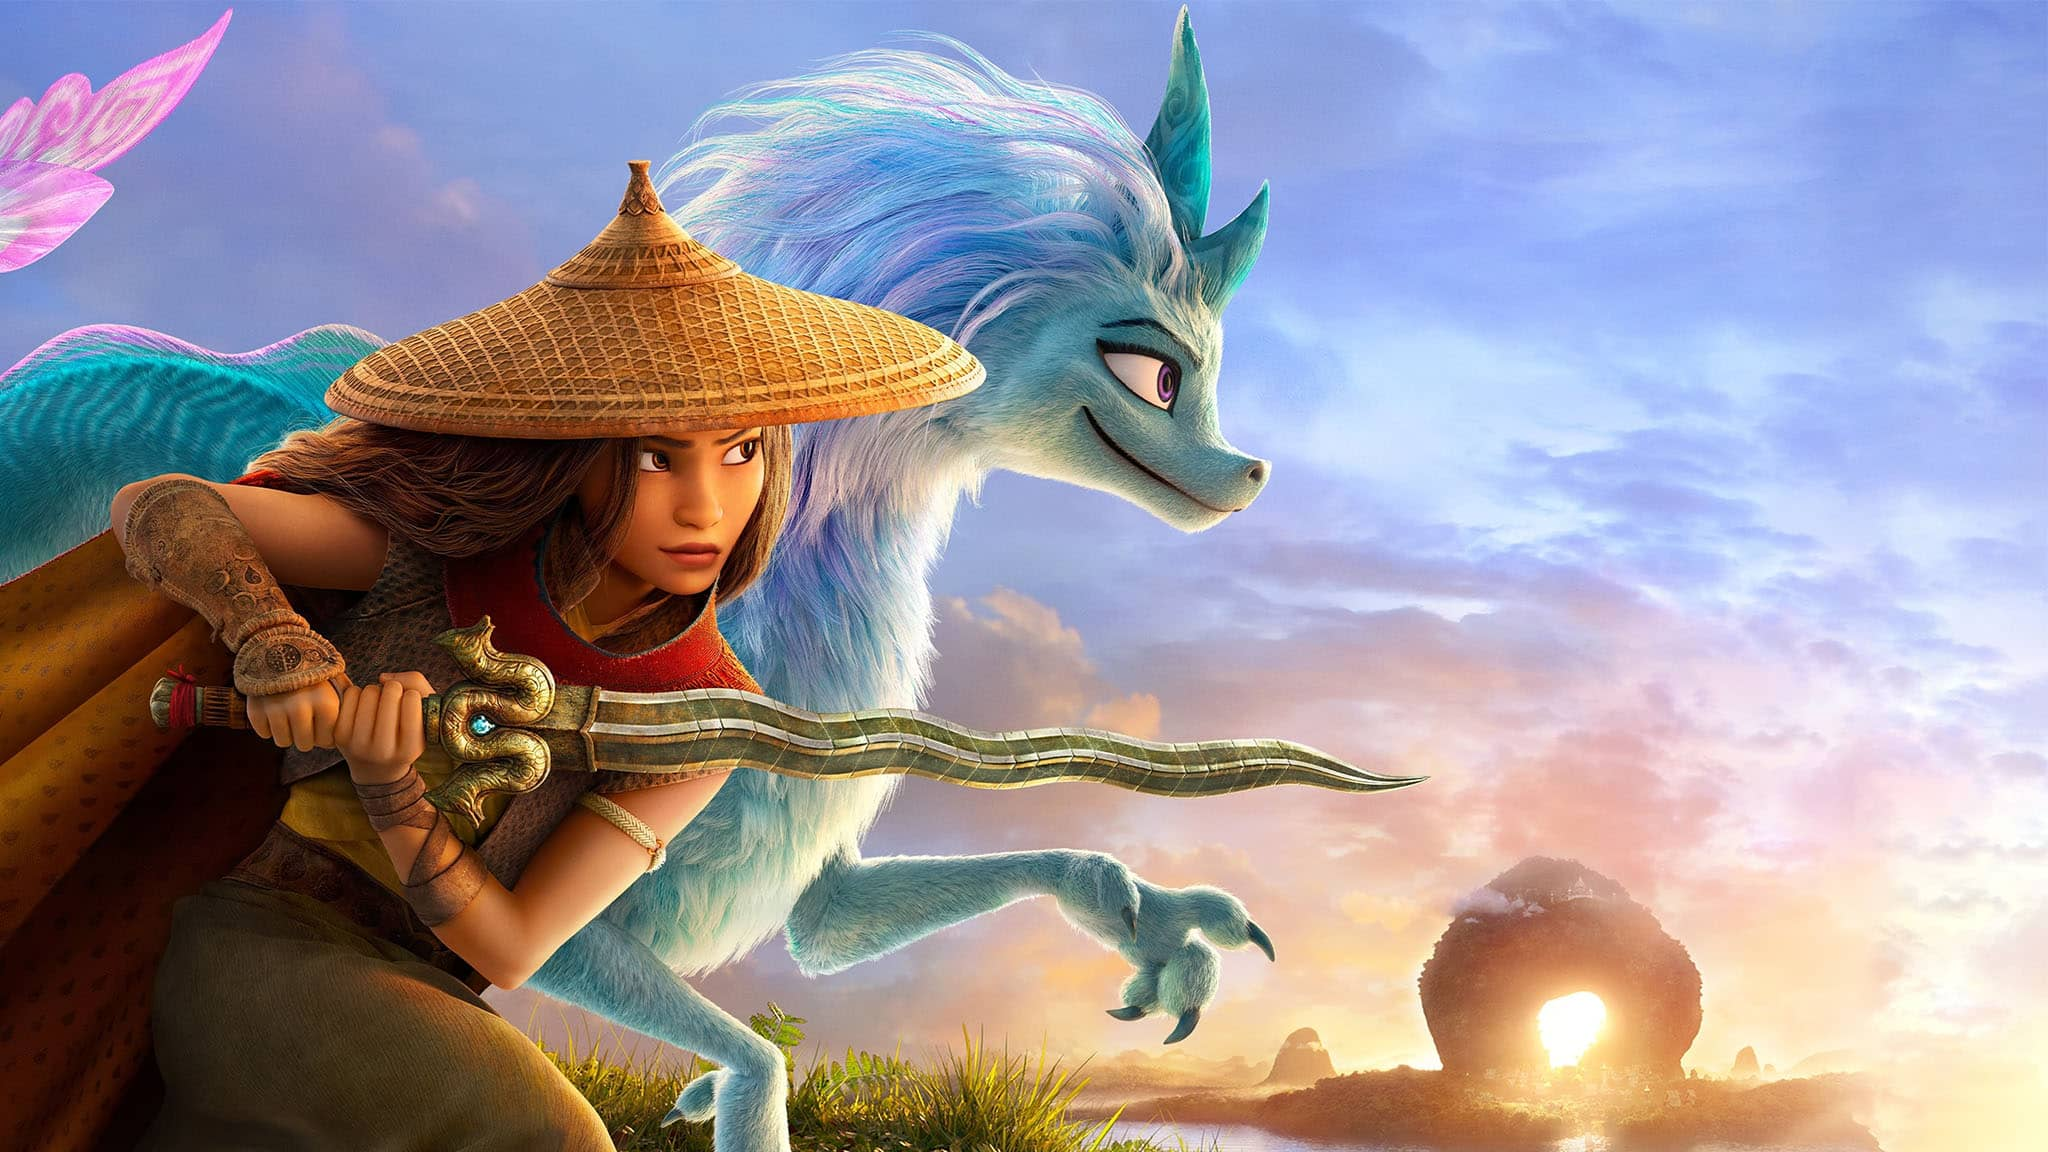 فيلم Raya and the Last Dragon 2021 مدبلج